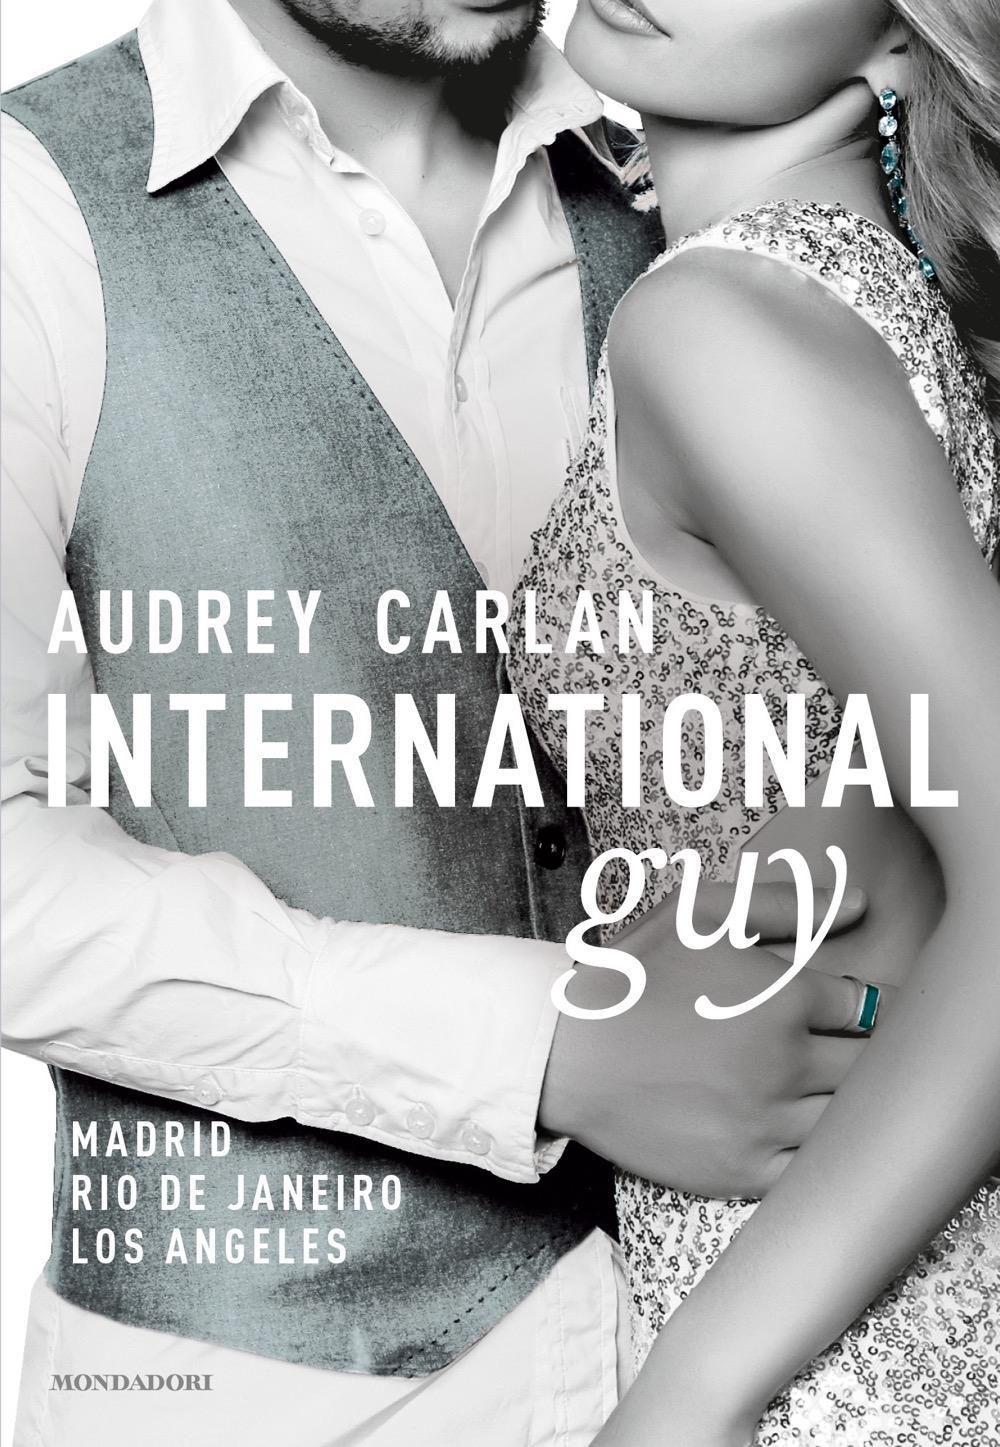 International Guy - 4. Madrid, Rio De Janeiro, Los Angeles